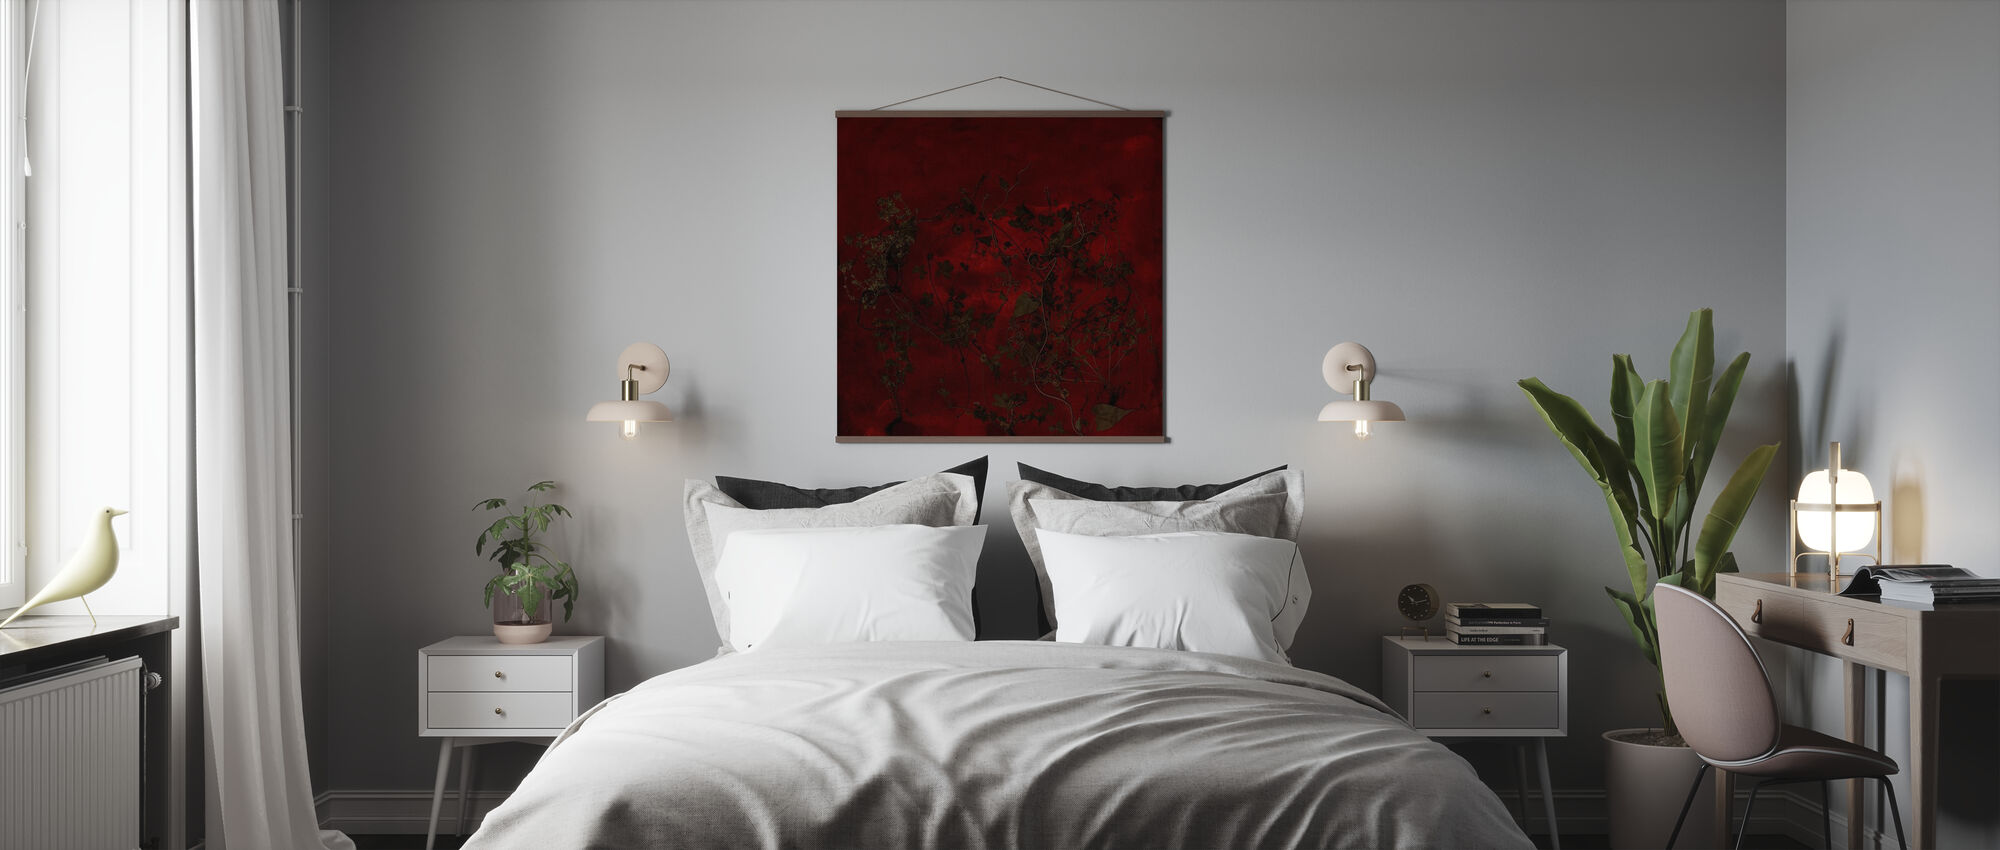 Nacht Tuin - Poster - Slaapkamer